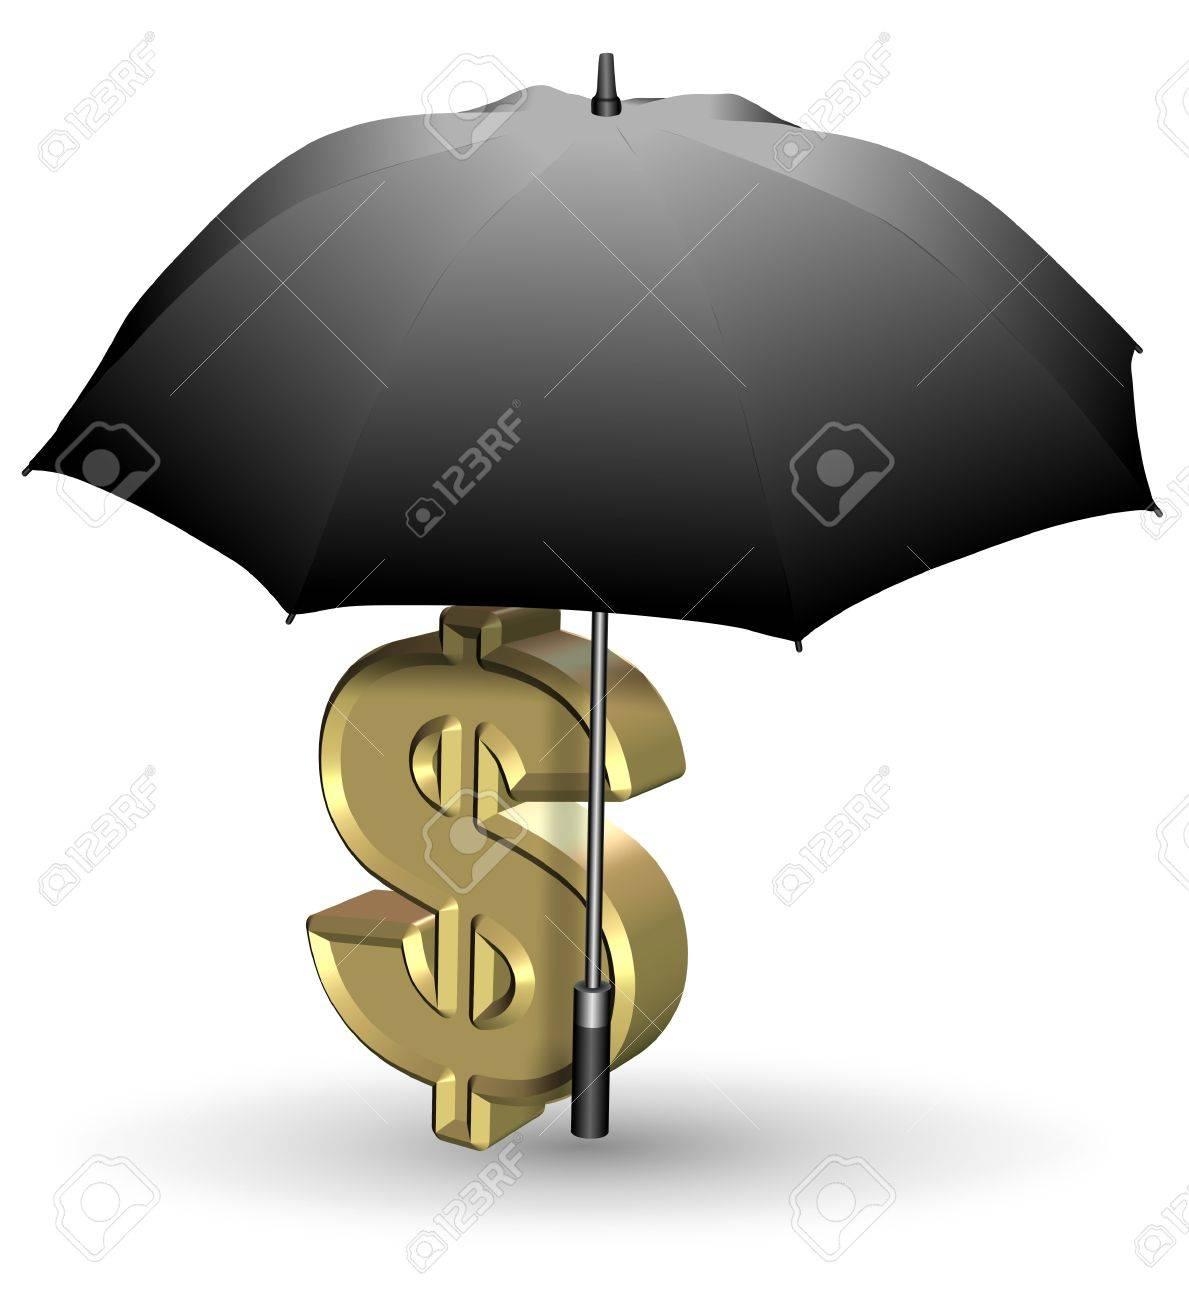 Golden dollar symbol under open black umbrella Stock Photo - 18838033